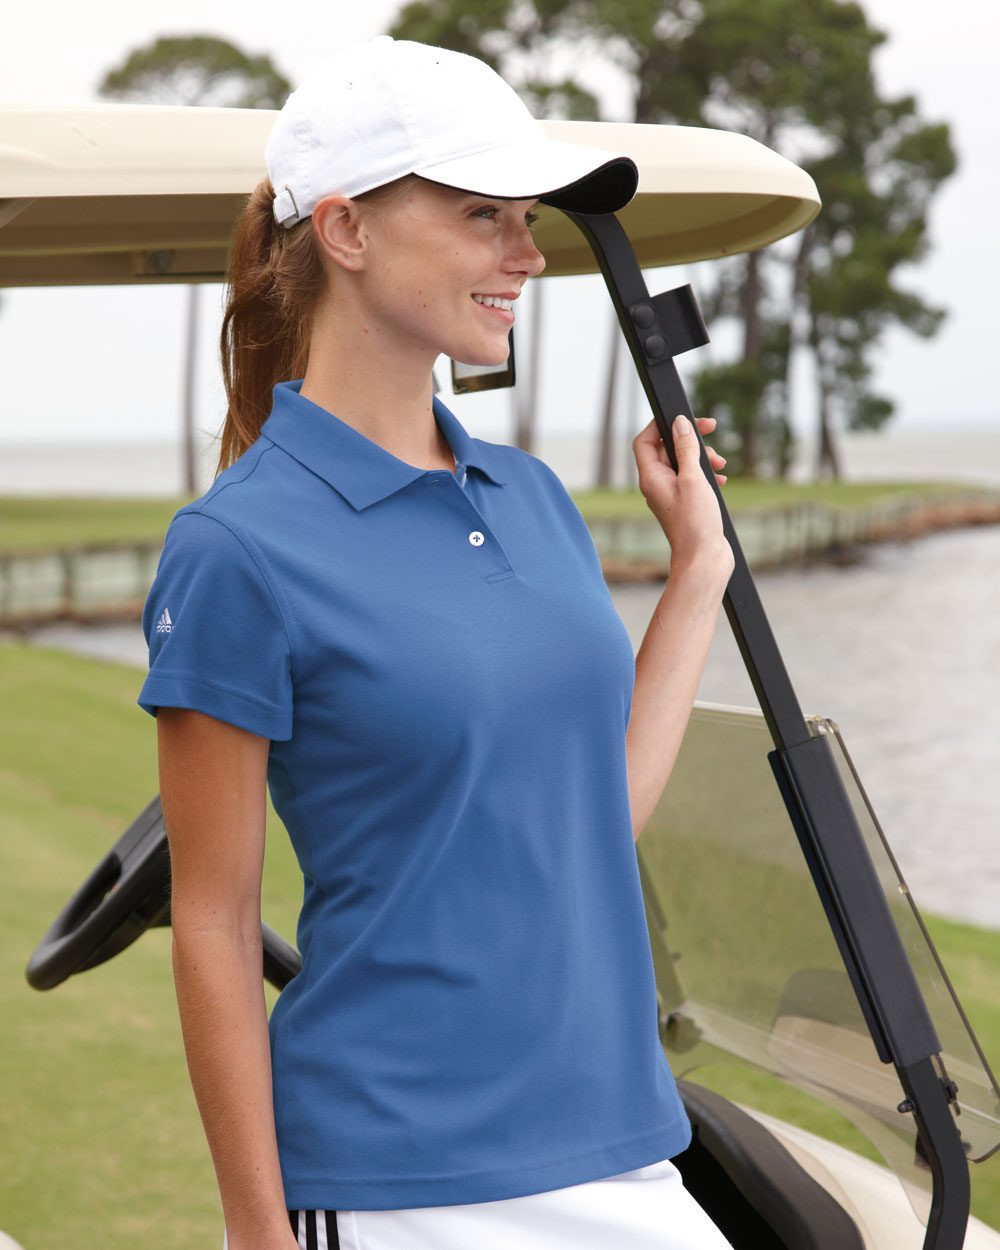 Adidas Golf Ladies ClimaLite Pique Polo A85